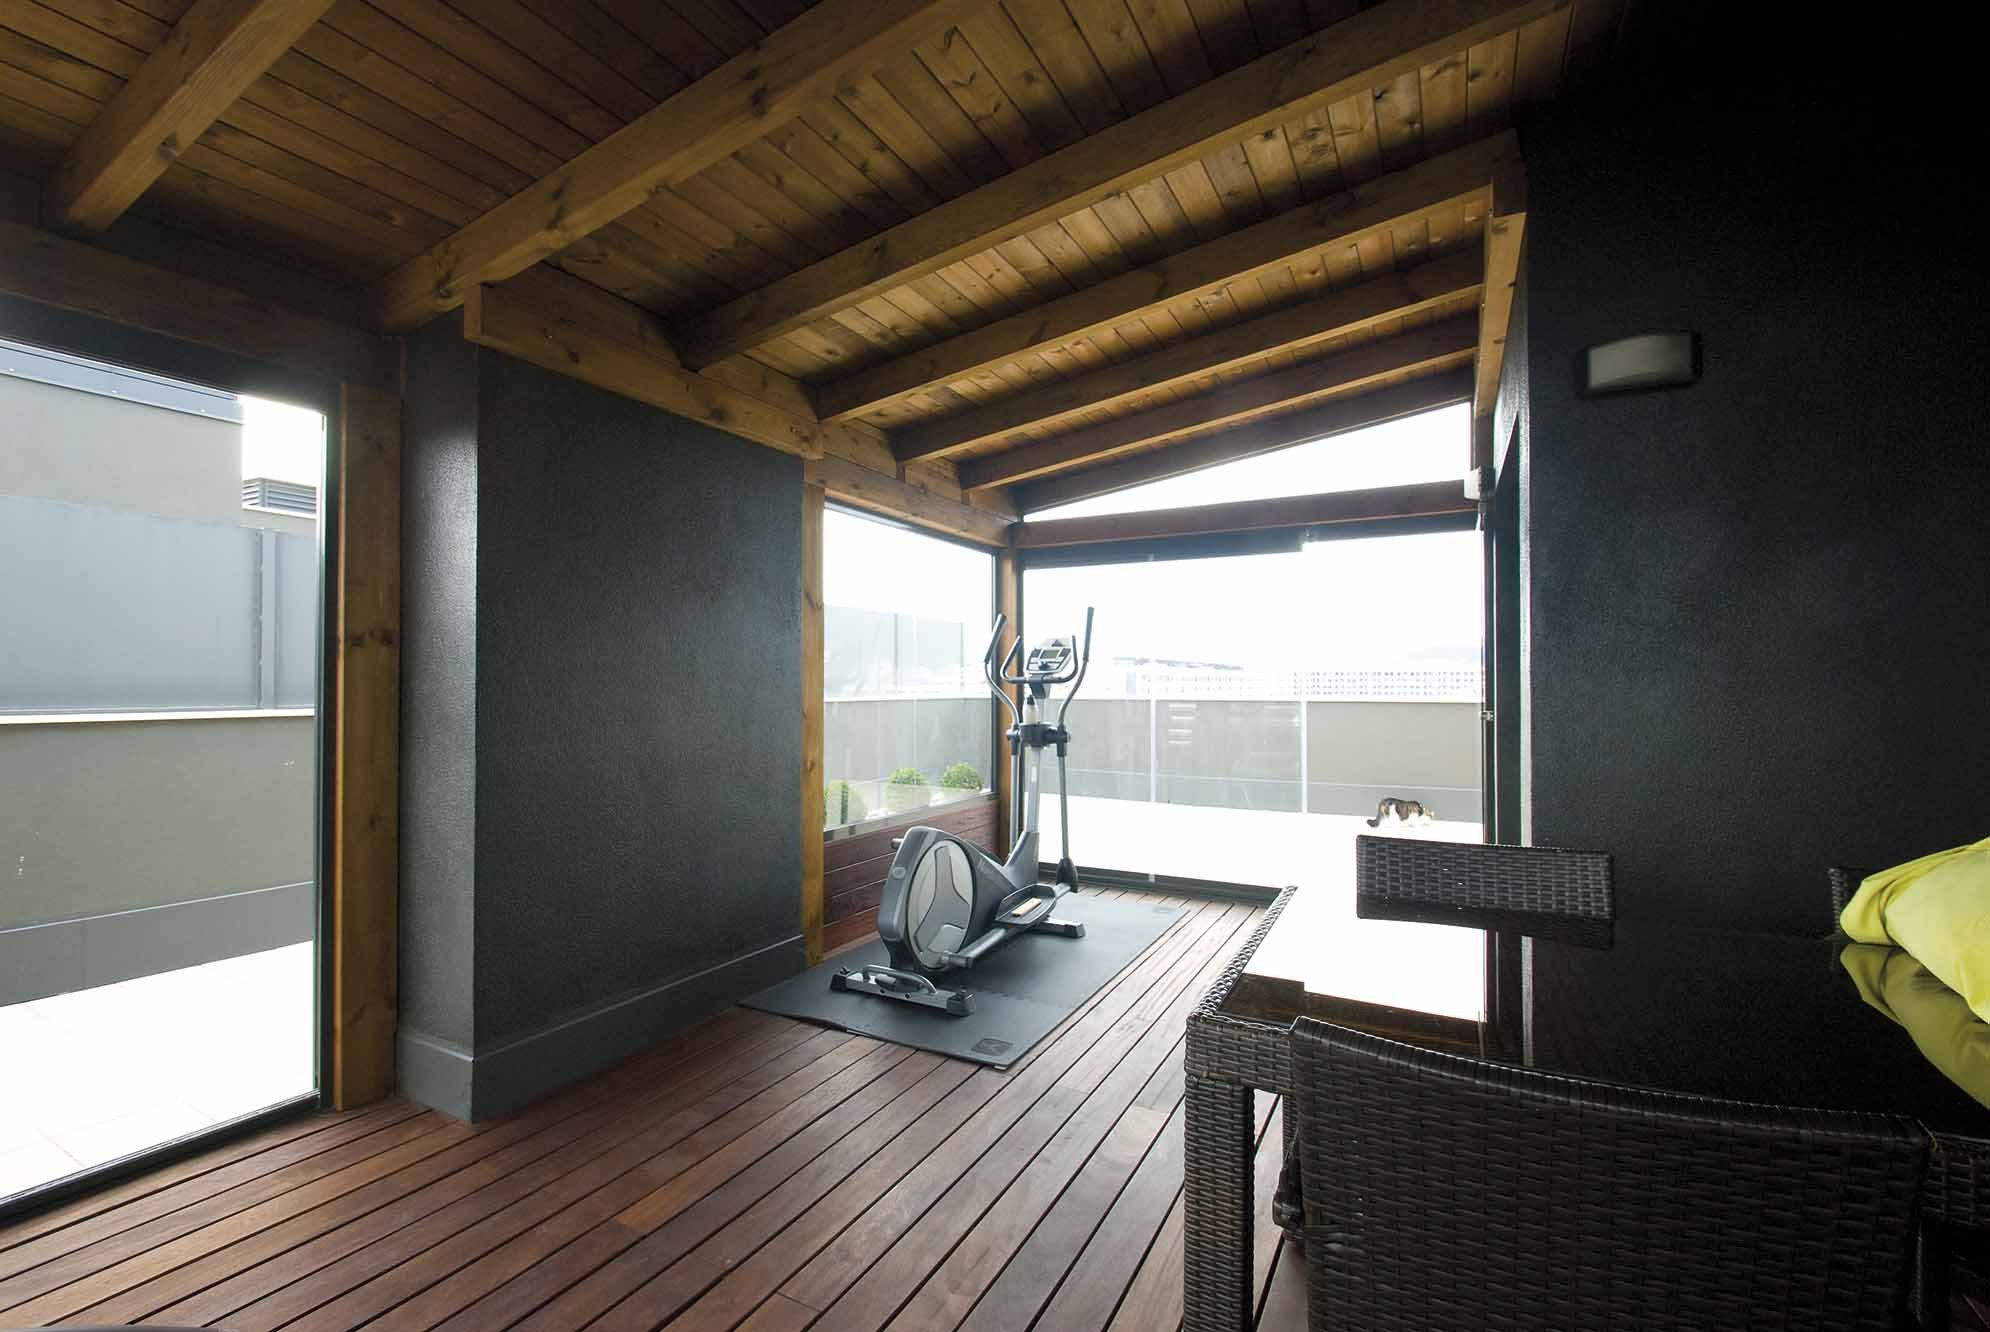 Porche de madera con cubierta de madera de pino